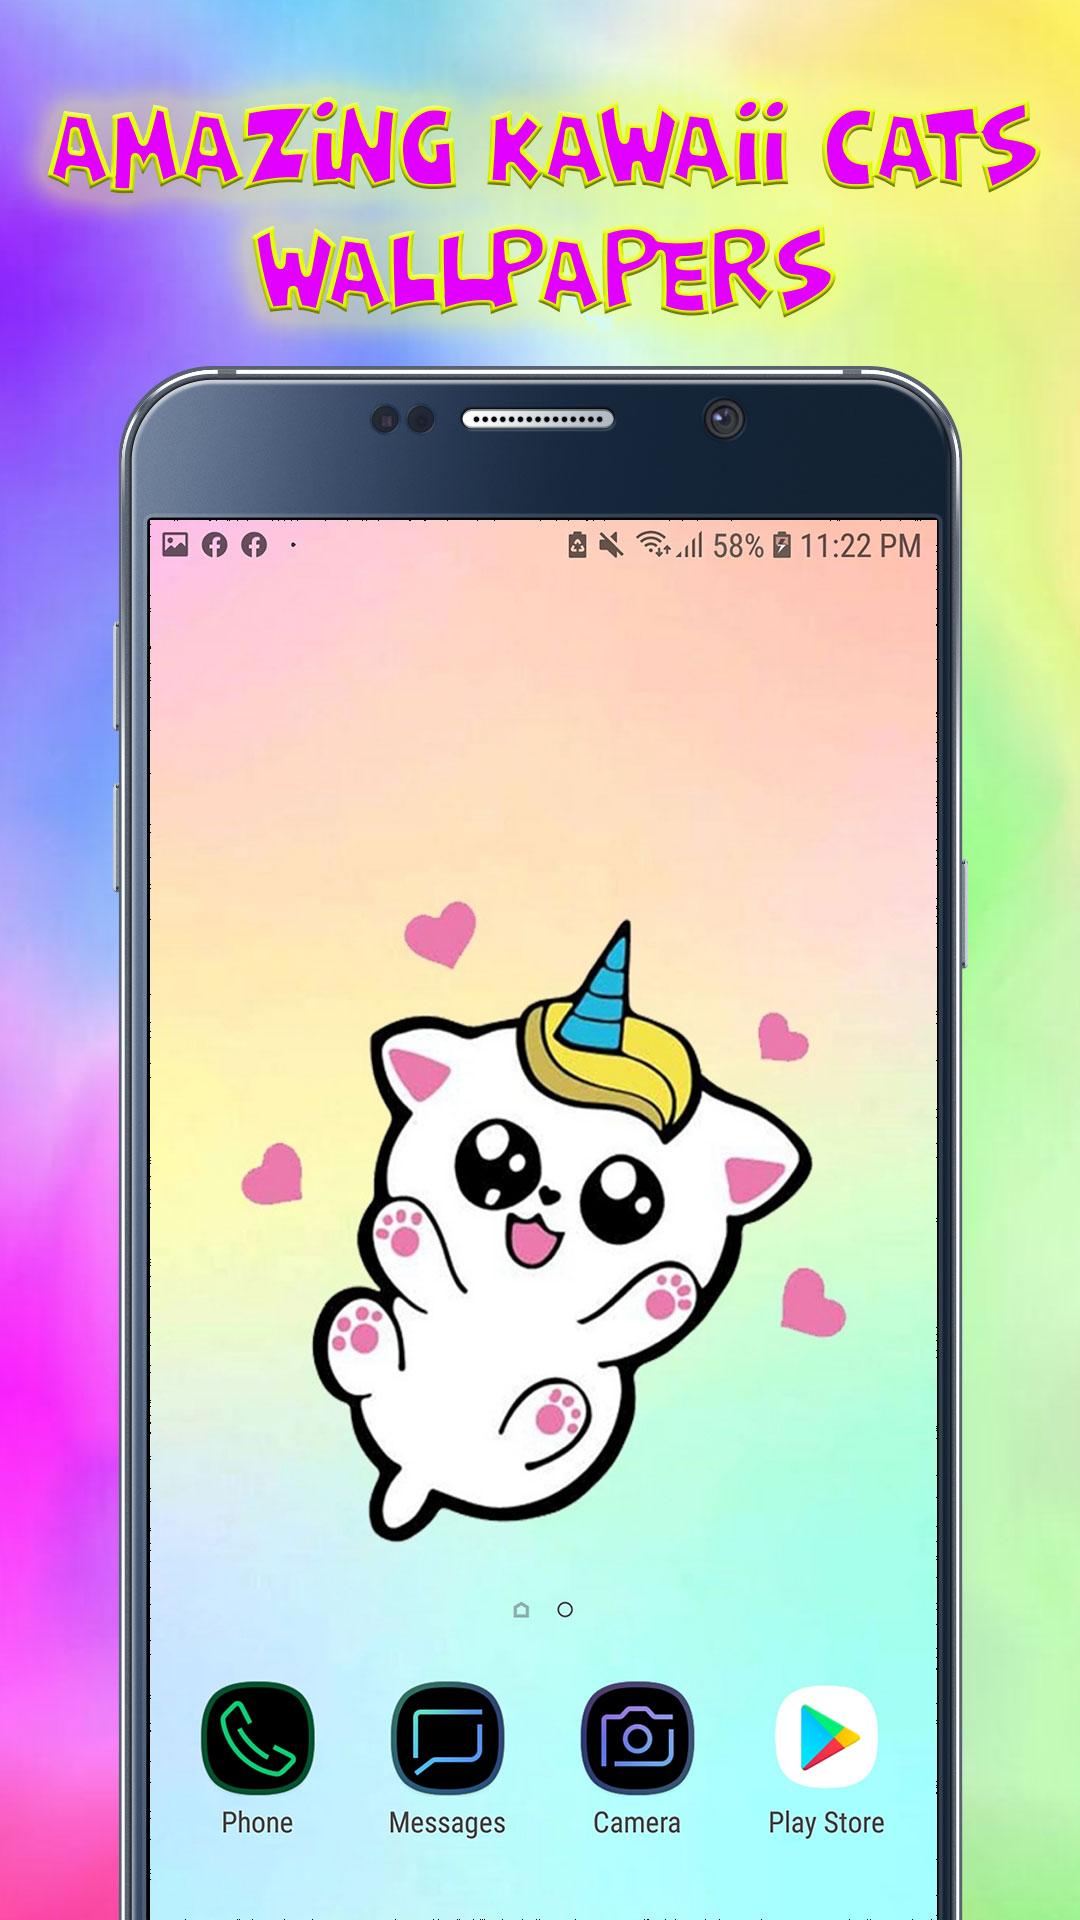 Amazing Kawaii Cats Wallpapers - Cute Backgrounds